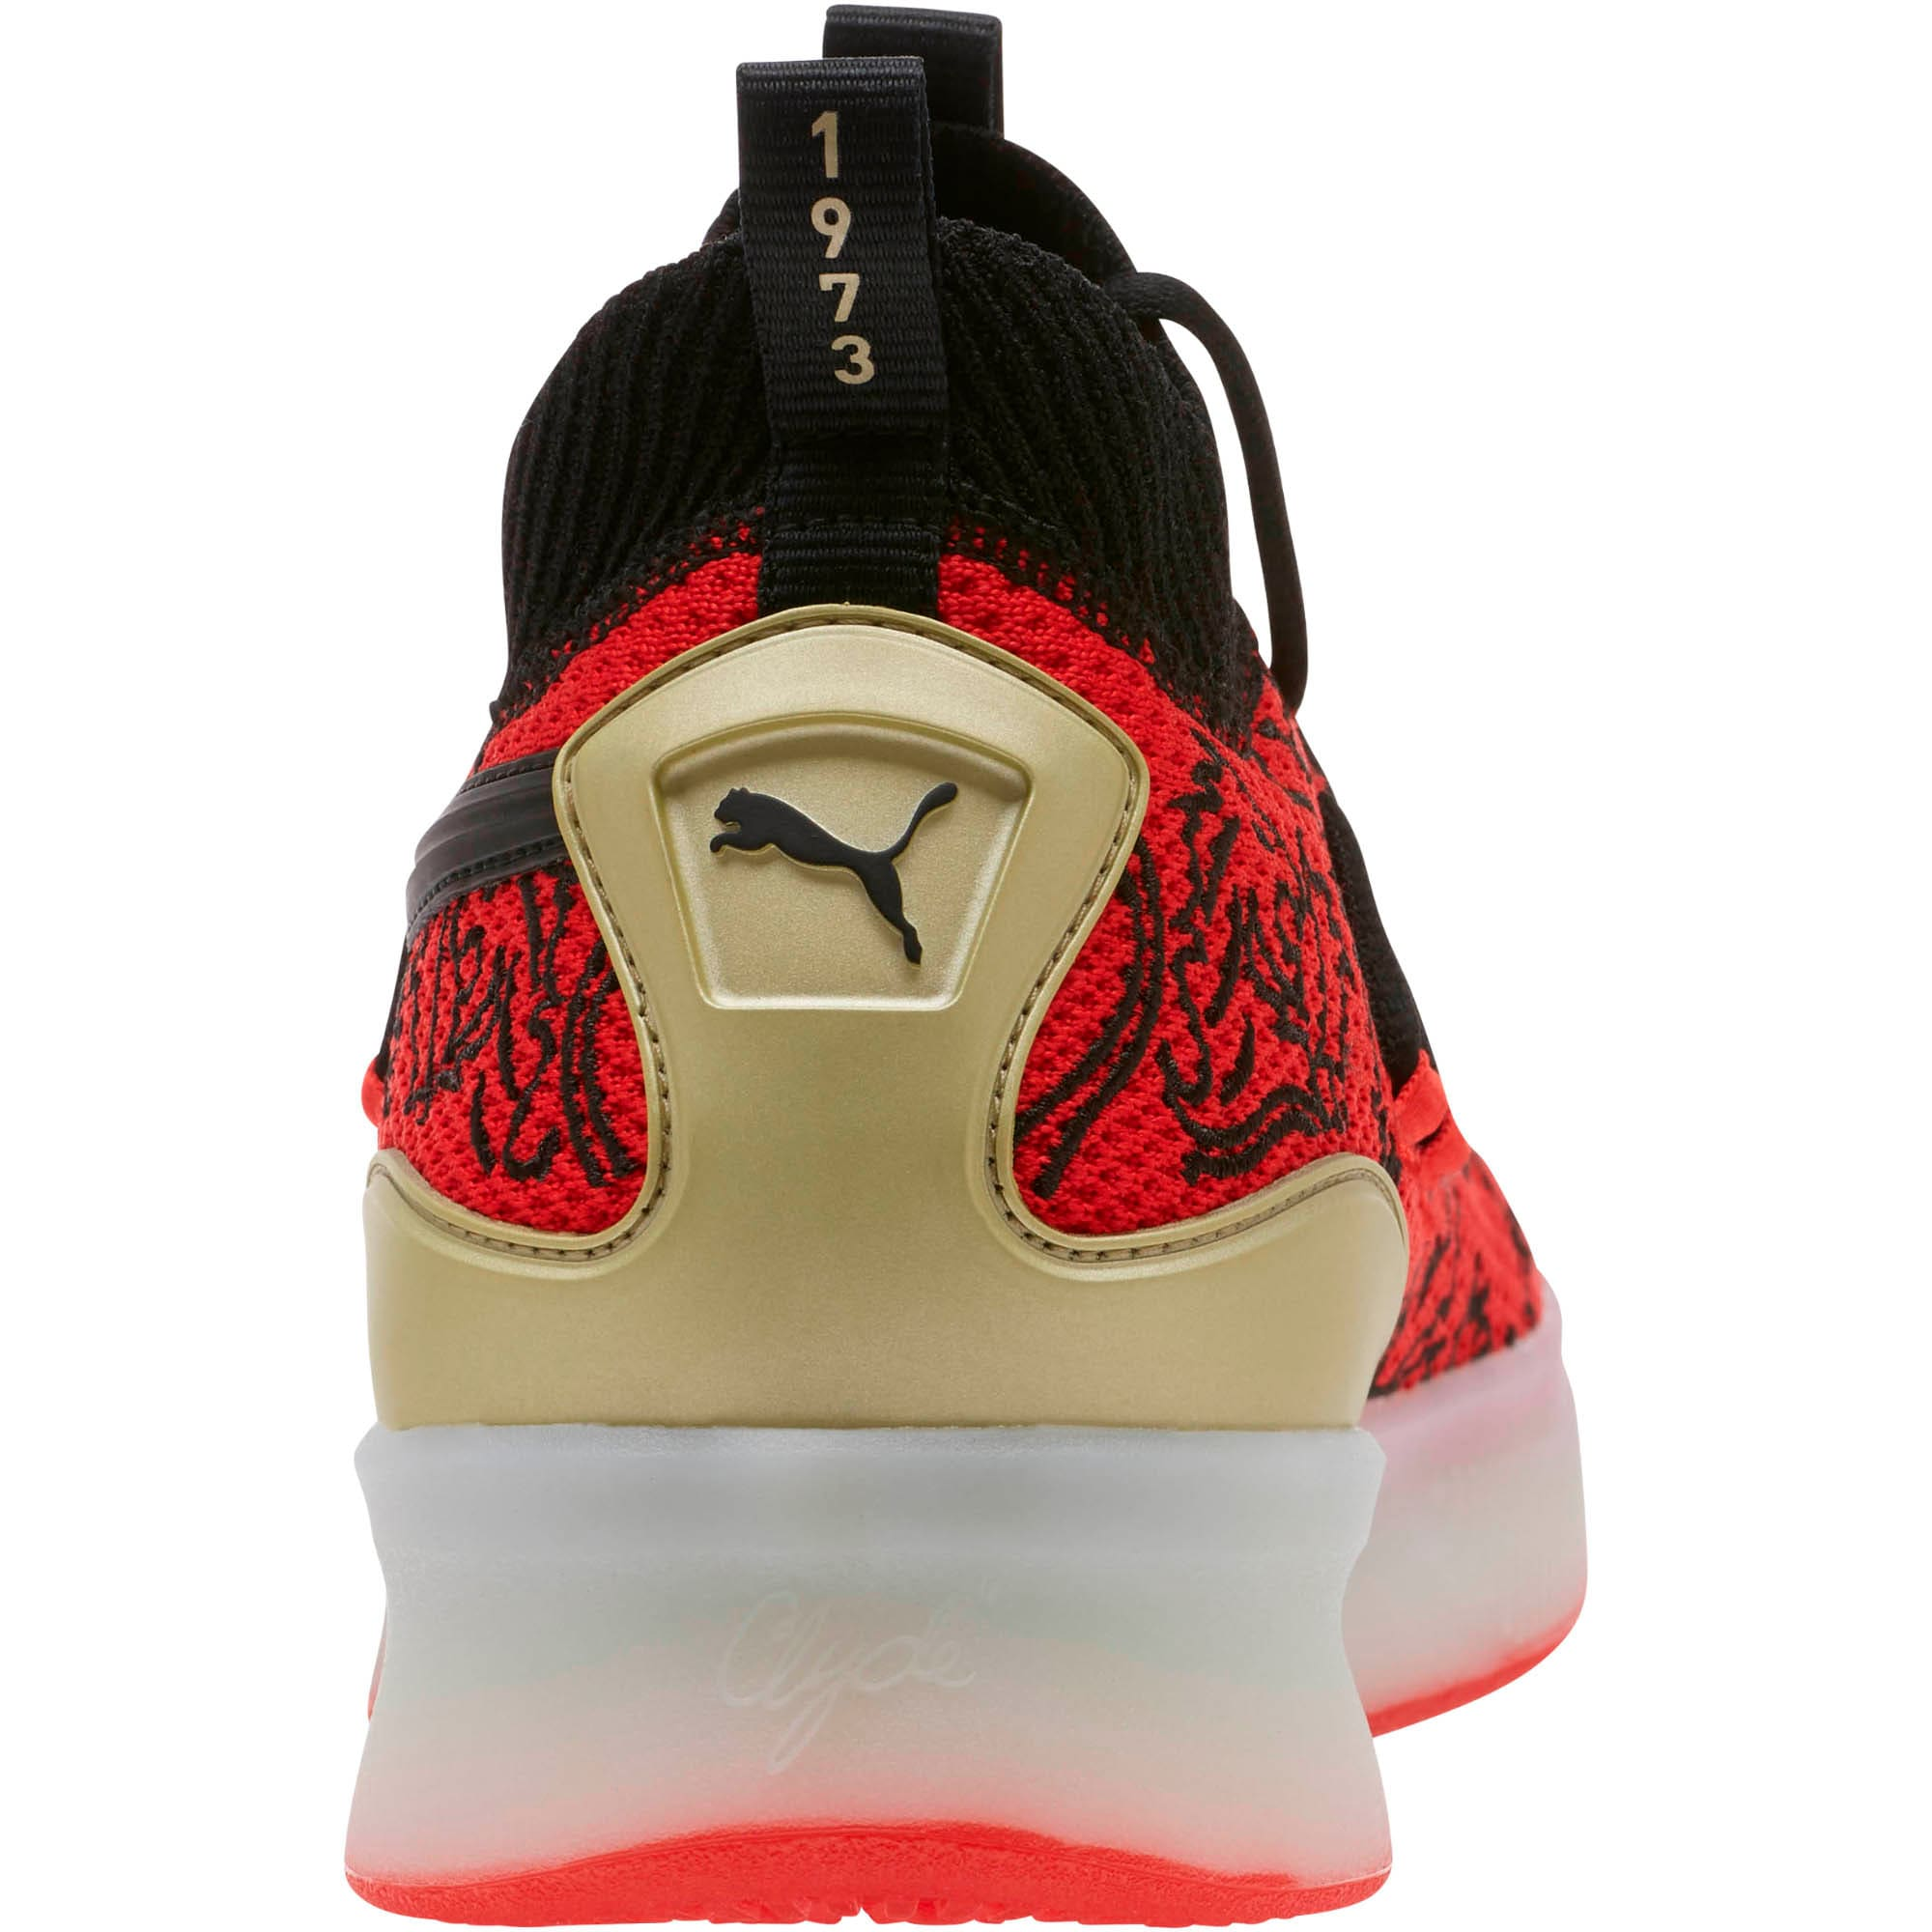 Thumbnail 3 of Clyde Court London Men's Basketball Shoes, High Risk Red-Puma Black, medium